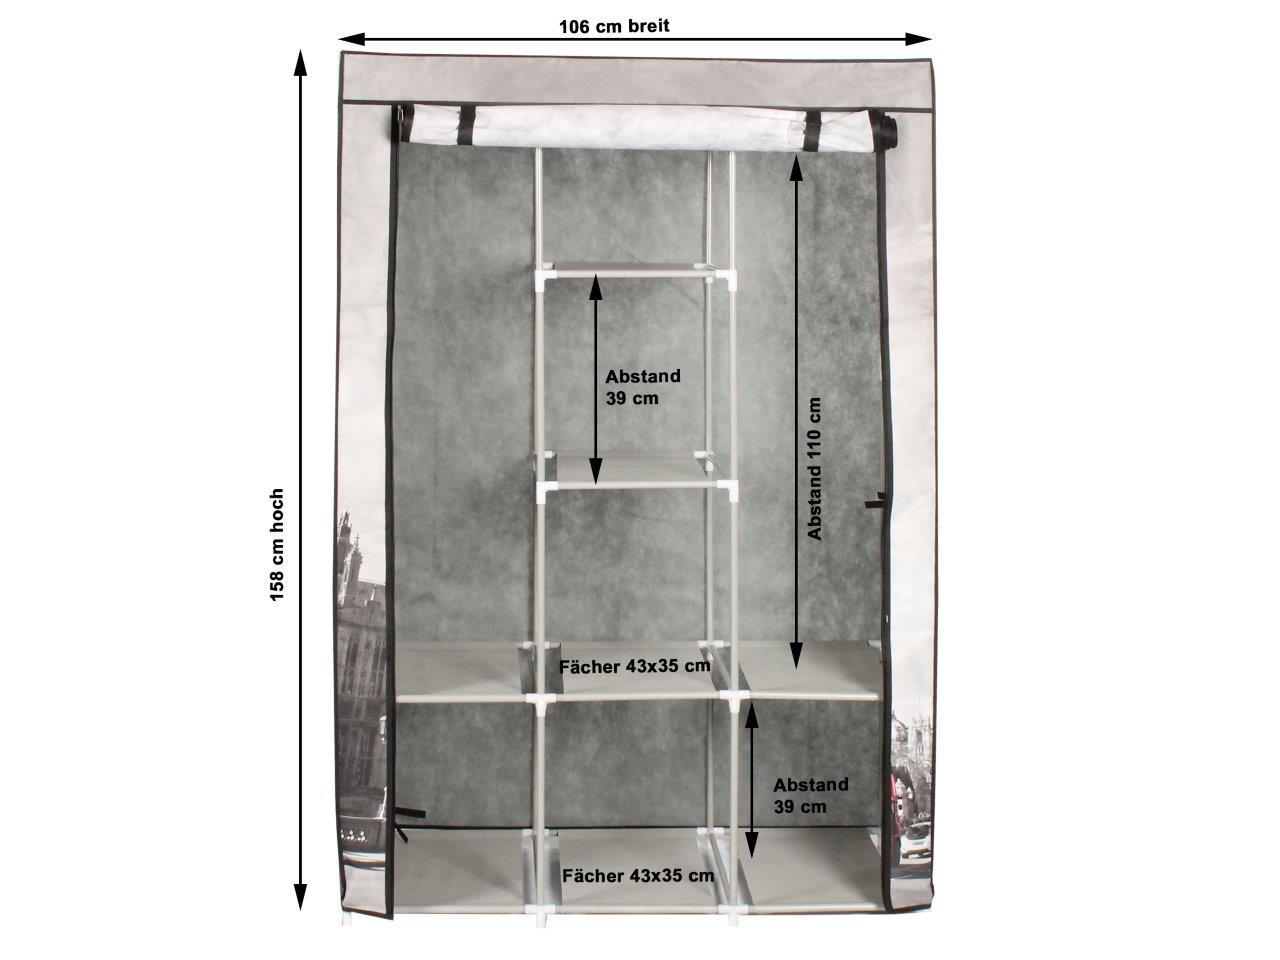 stoffschrank kleiderschrank roter telefonzelle london 6. Black Bedroom Furniture Sets. Home Design Ideas